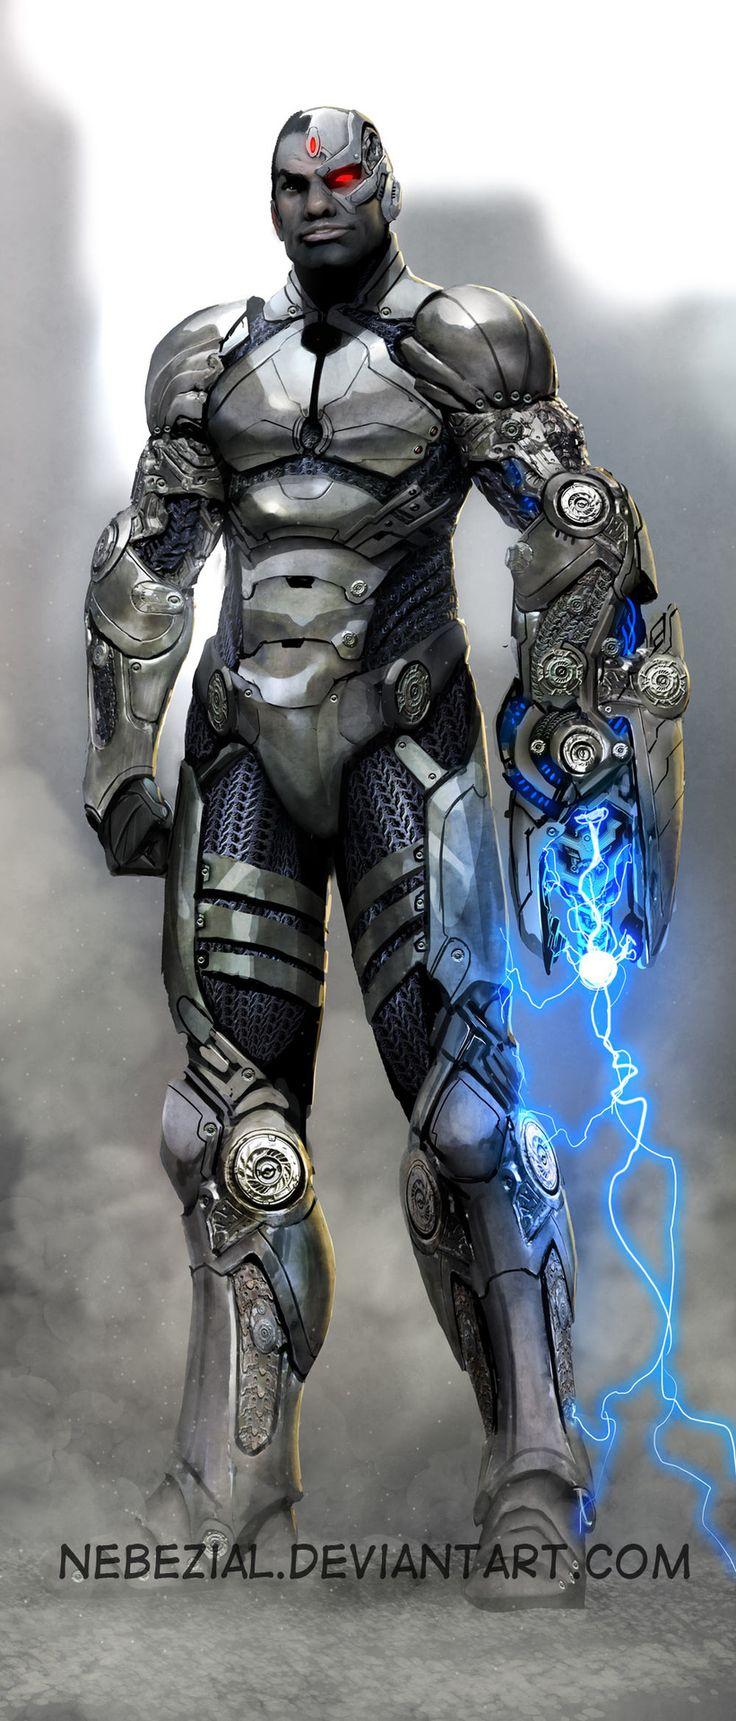 OMG! He is soooo metal! by nebezial